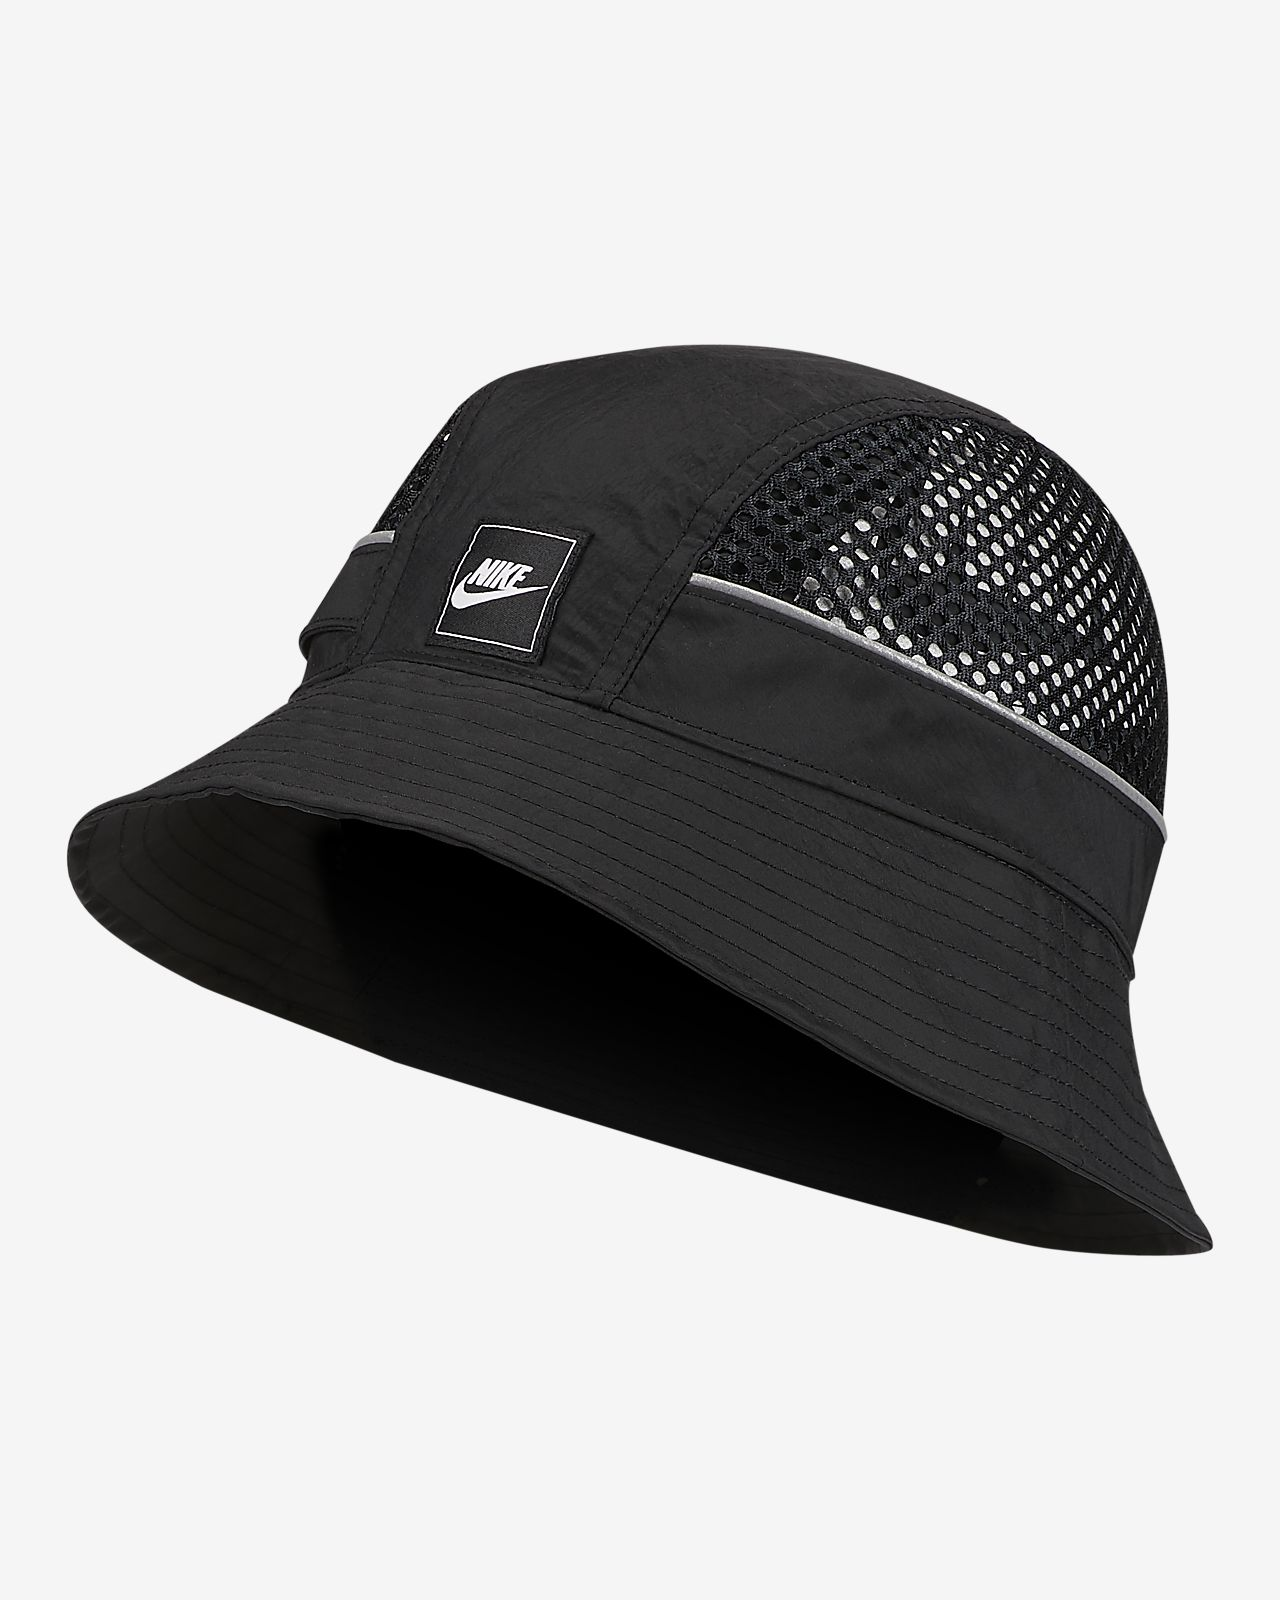 726eb9d2b42 Nike Sportswear Mesh Bucket Hat. Nike.com NL